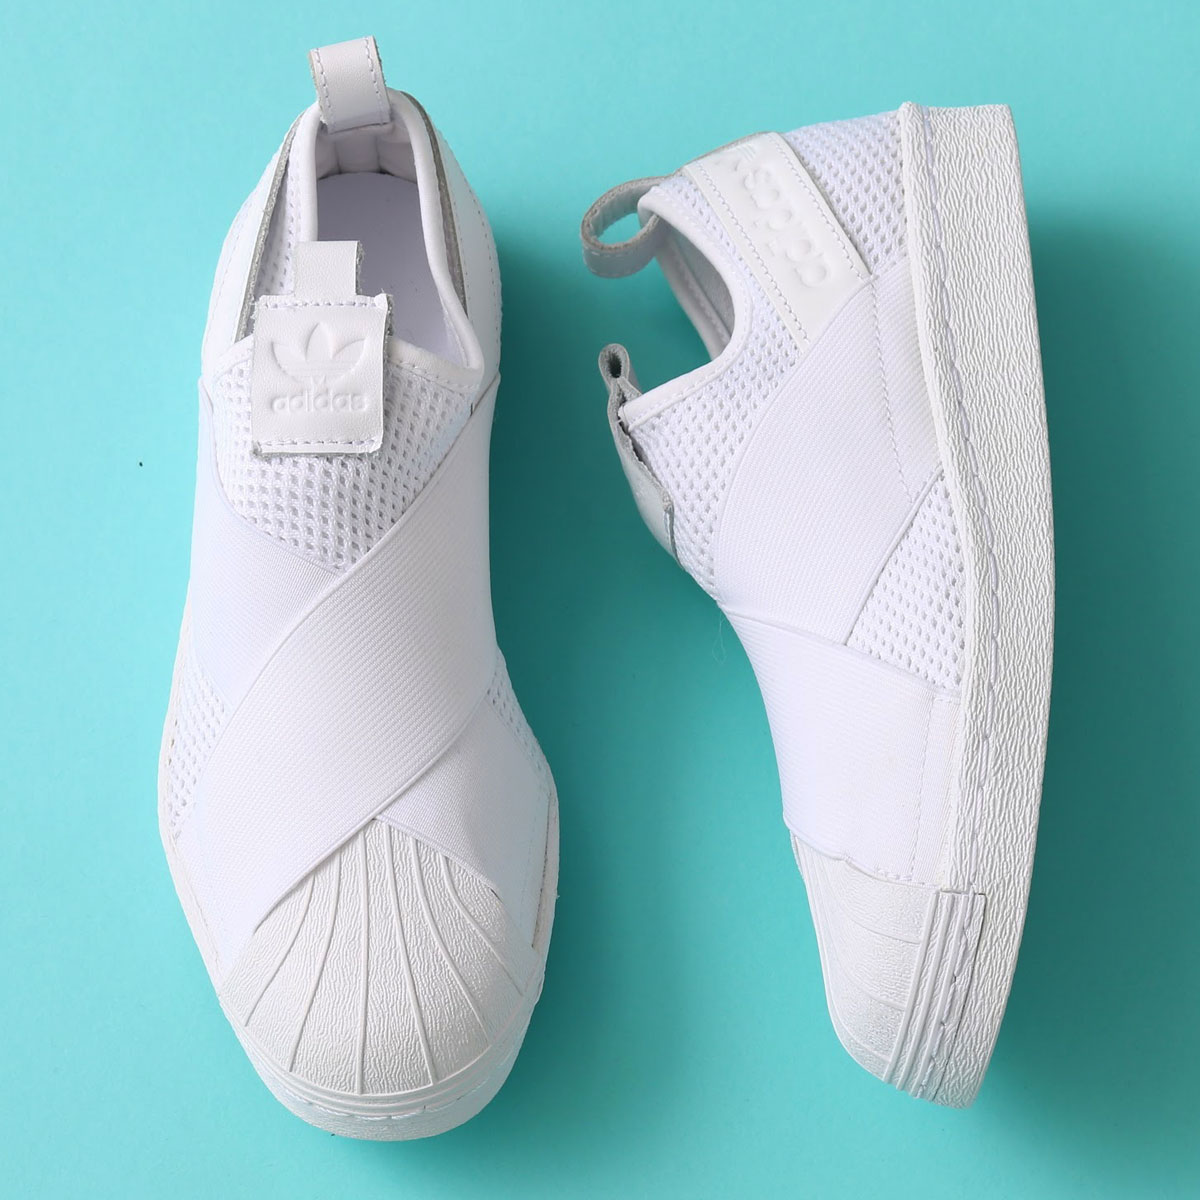 adidas Originals SUPERSTAR SlipOn W (アディダス オリジナルス スーパースター スリッポン W)(Running White/Running White/Core Black) 【メンズ レディース スニーカー】17SS-I